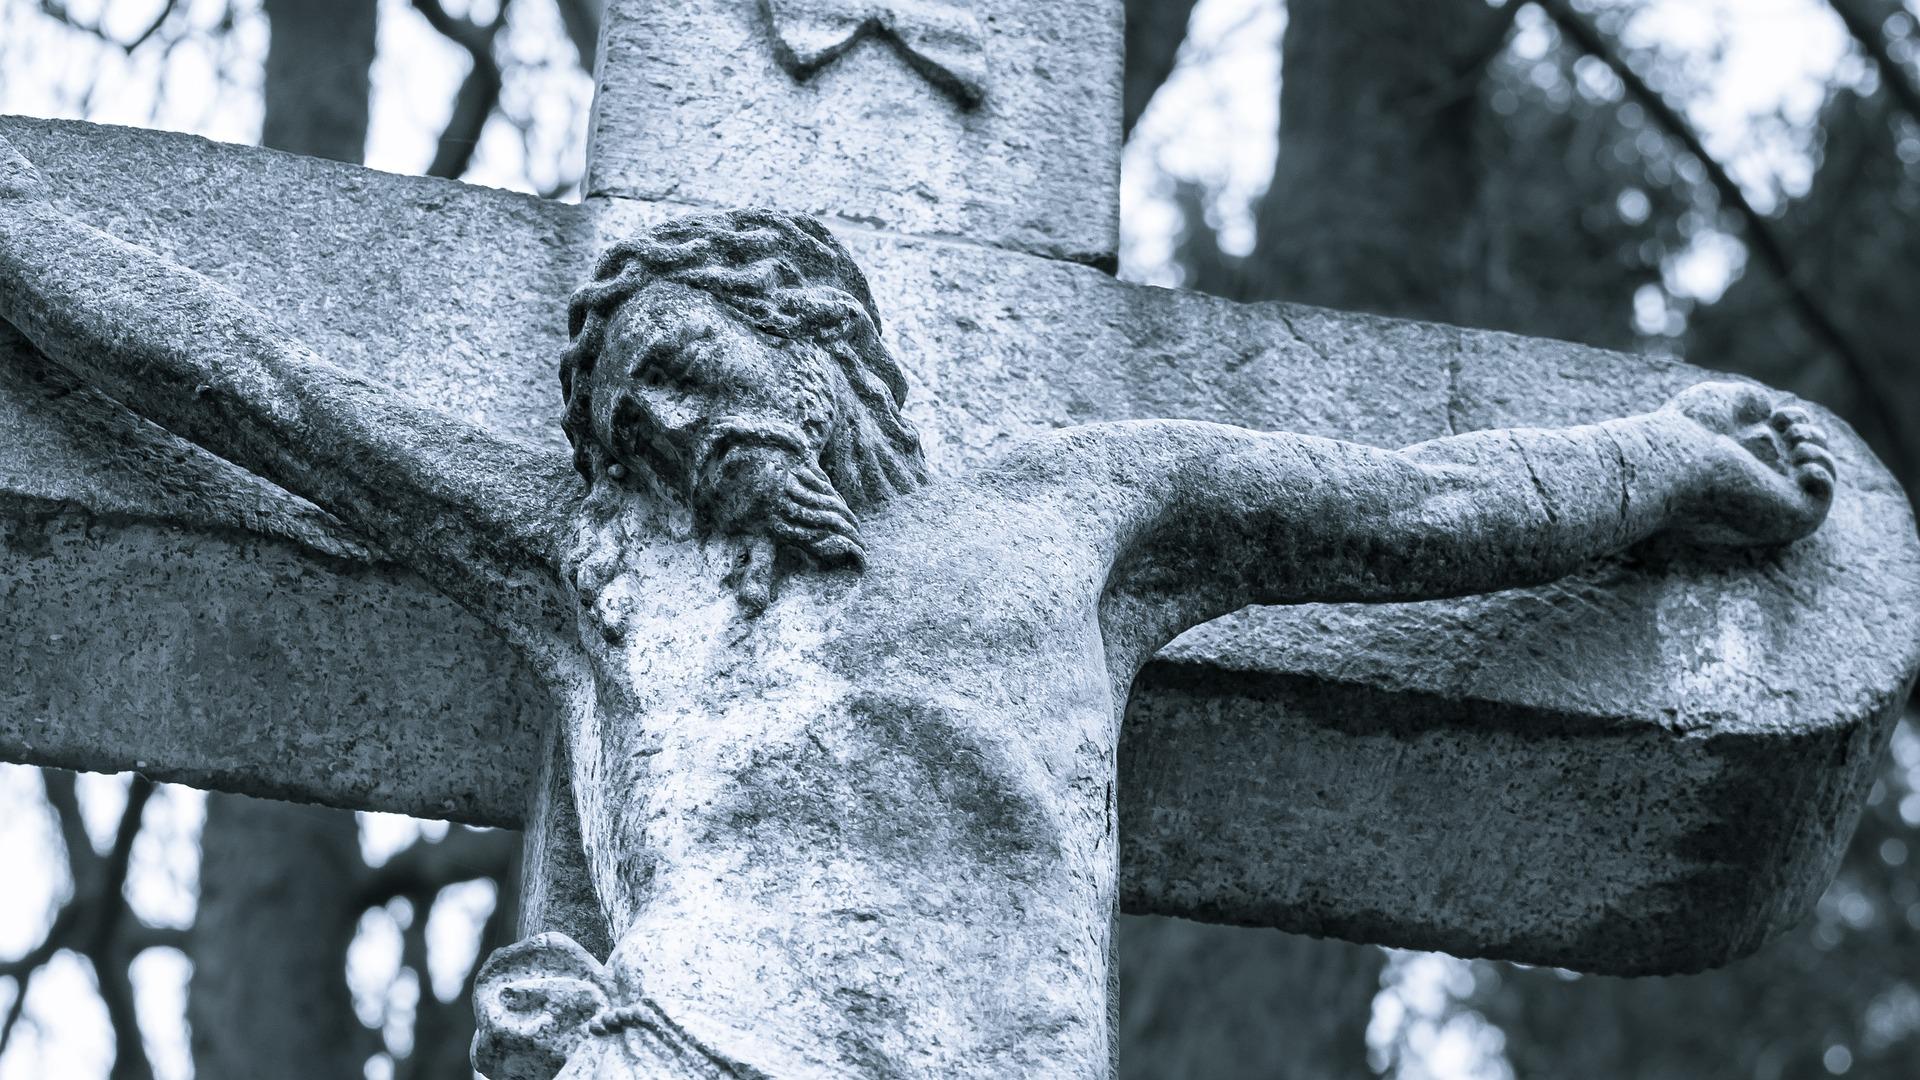 Pixabay - Jesus on the cross